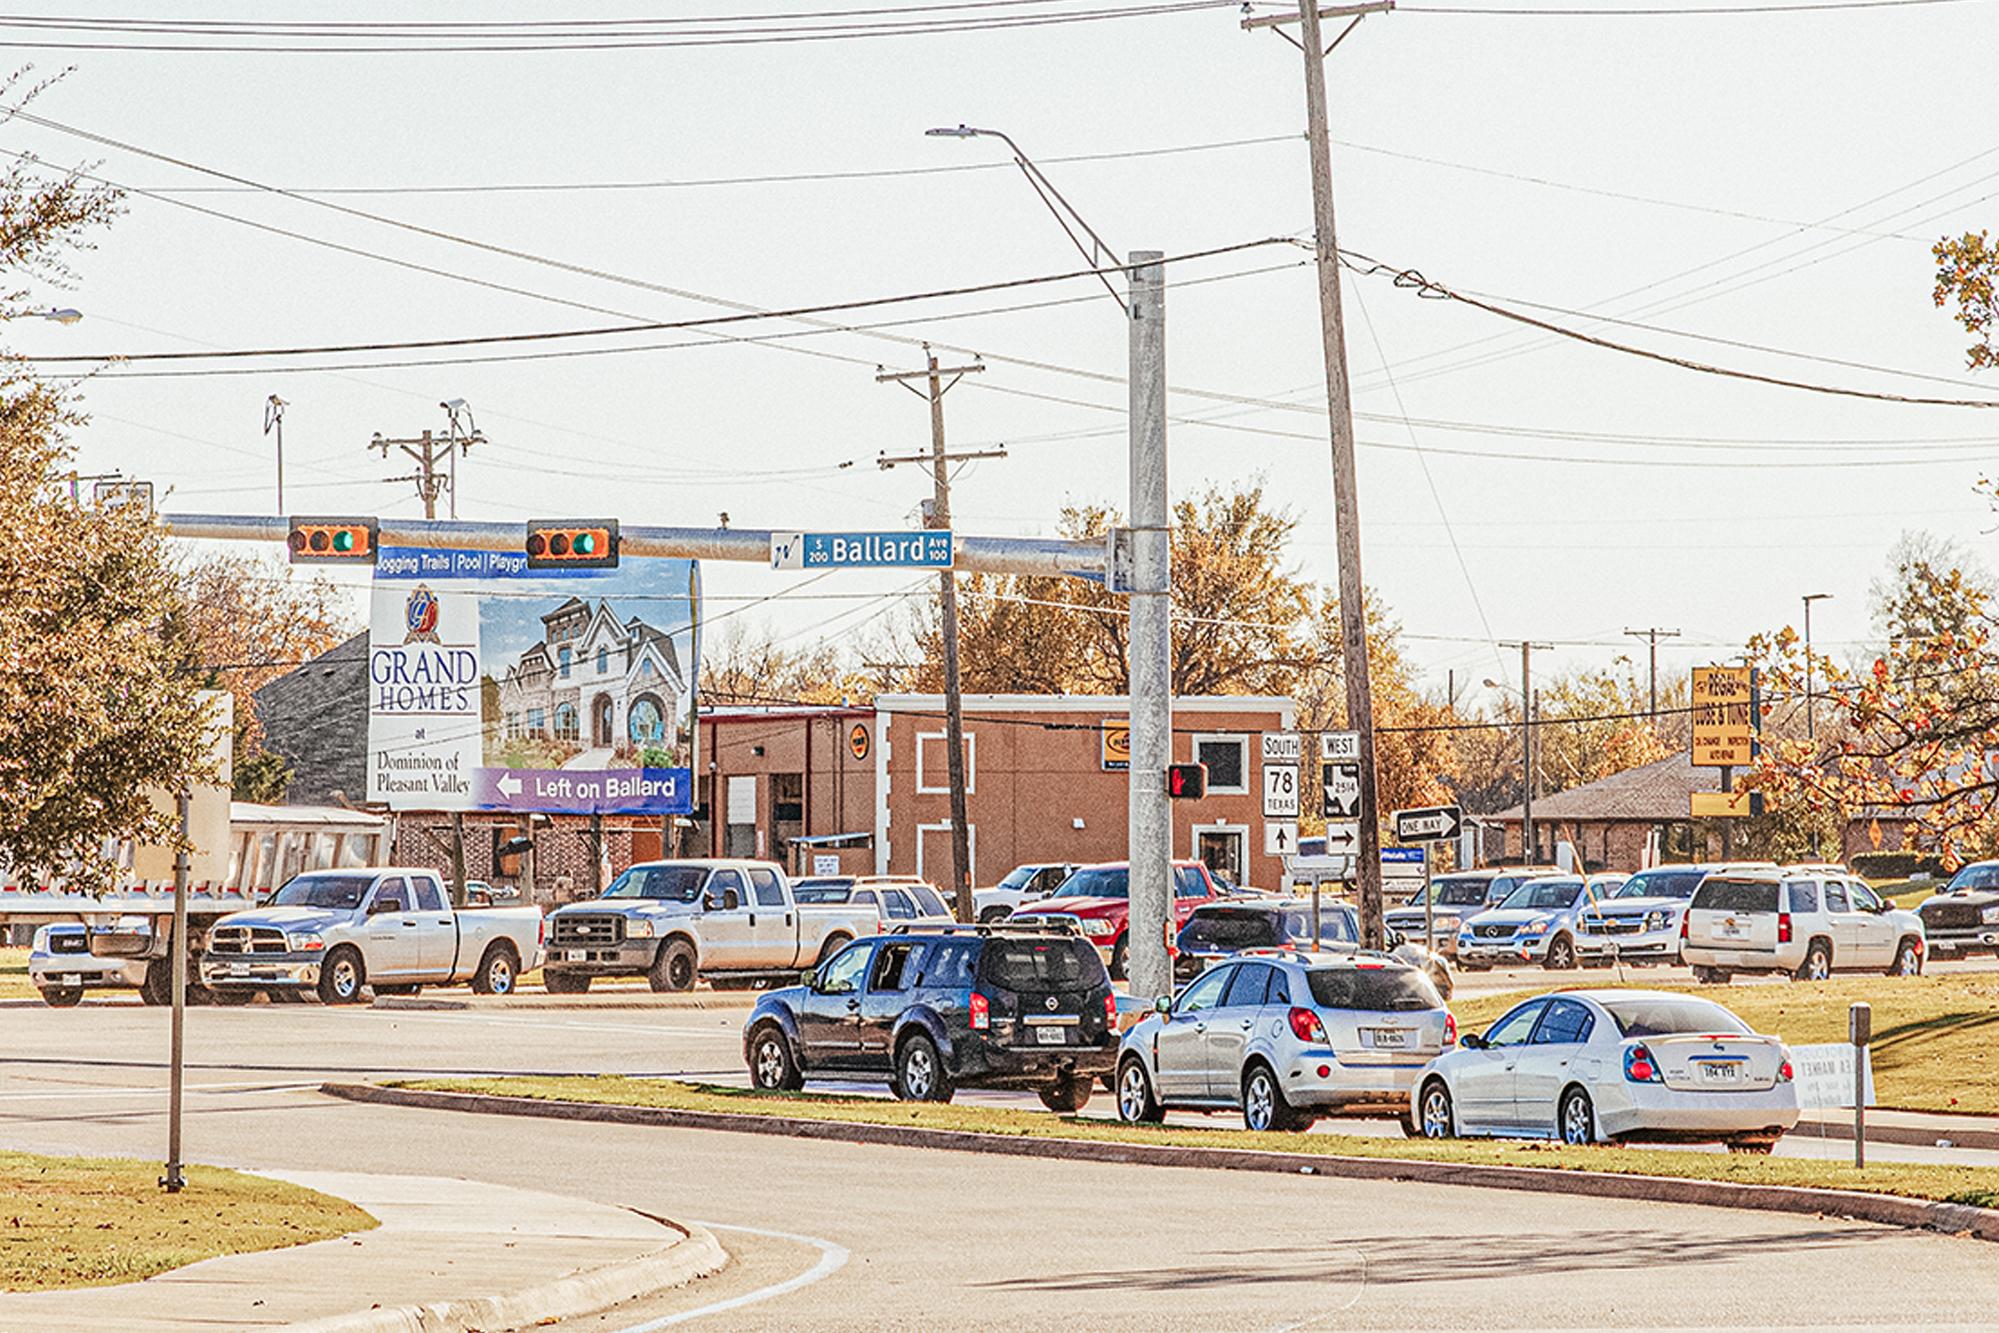 Stoplight in Collin County TX